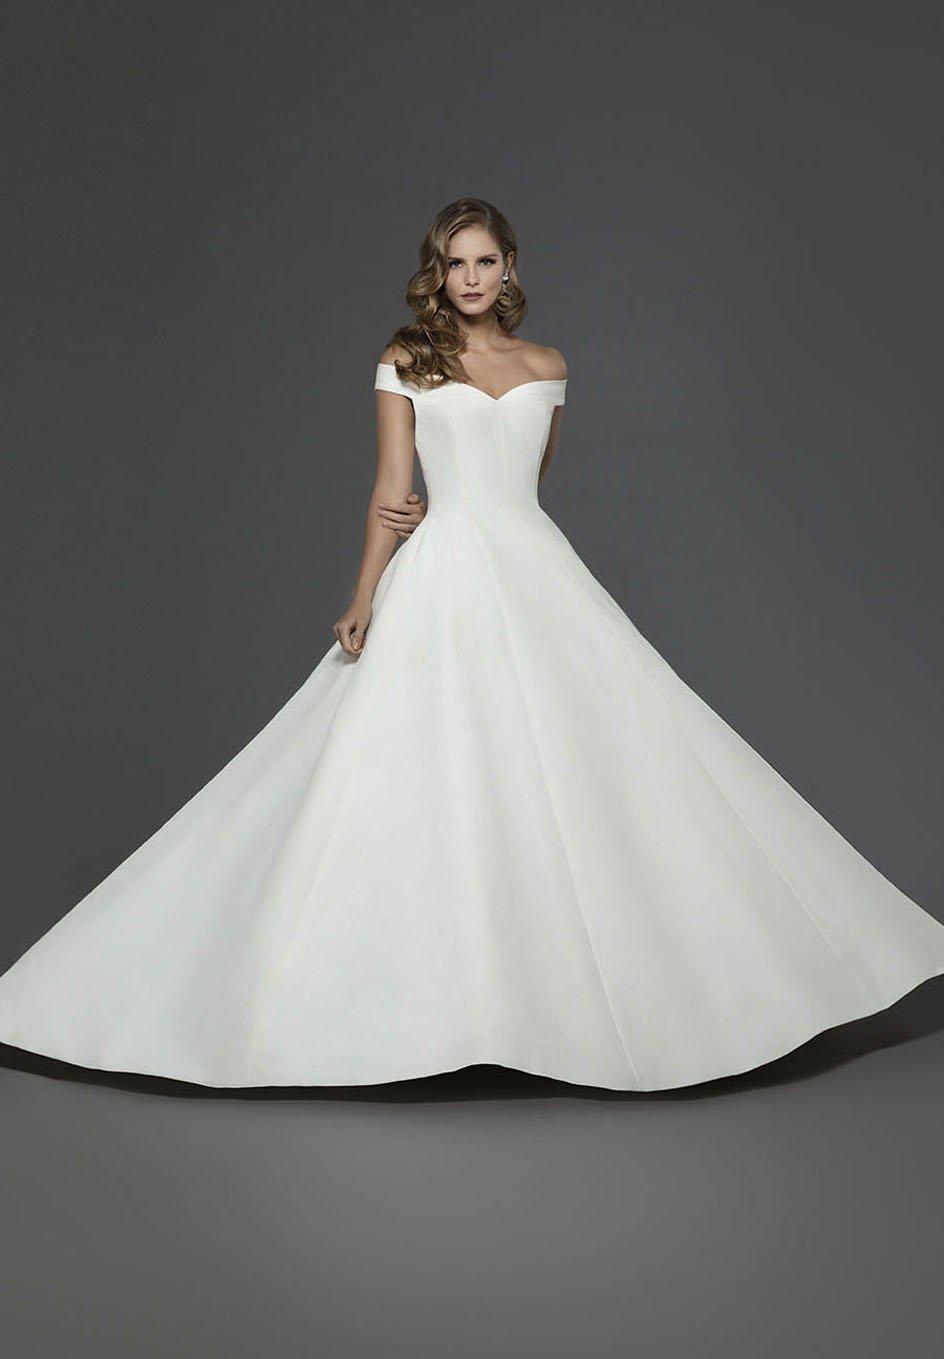 Bridals By Lori Matthew Christopher Wedding Dresses For Bridal Designer